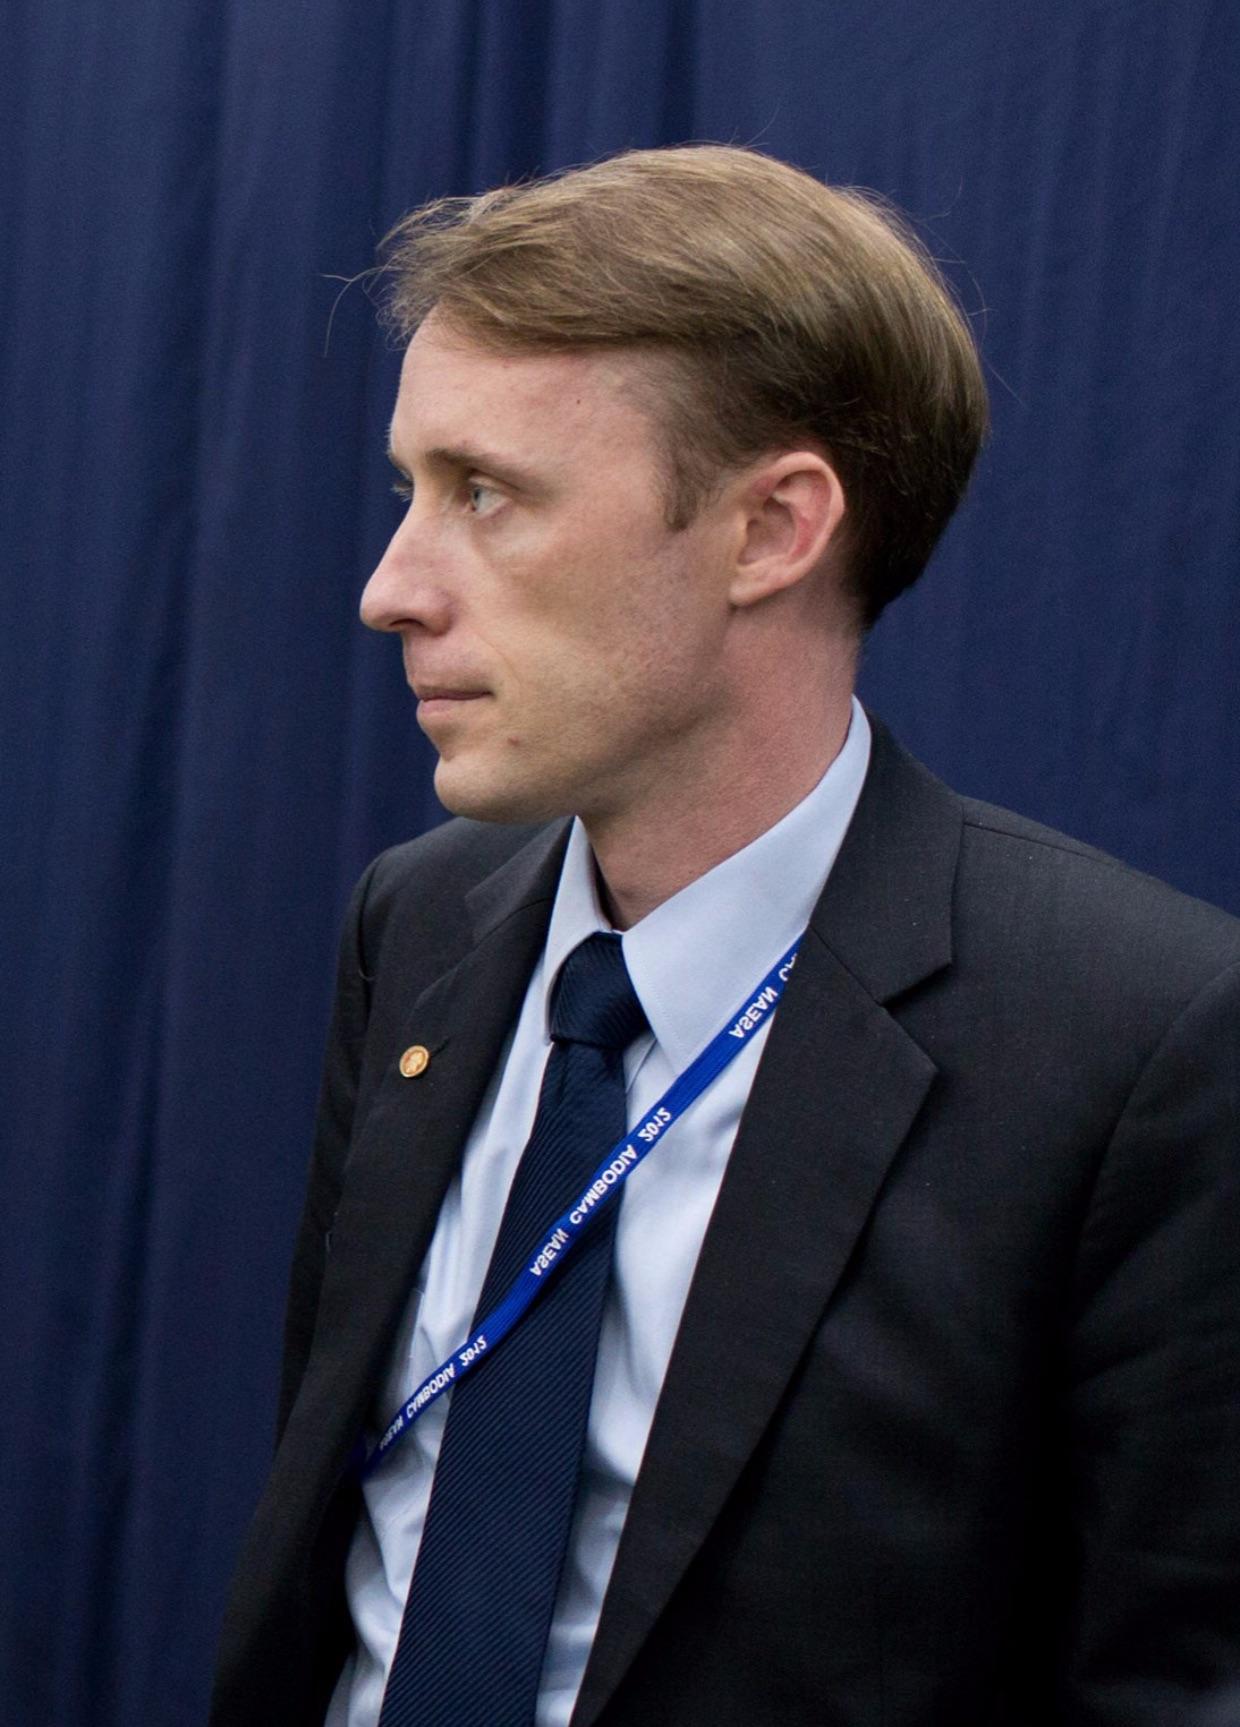 Jake Sullivan